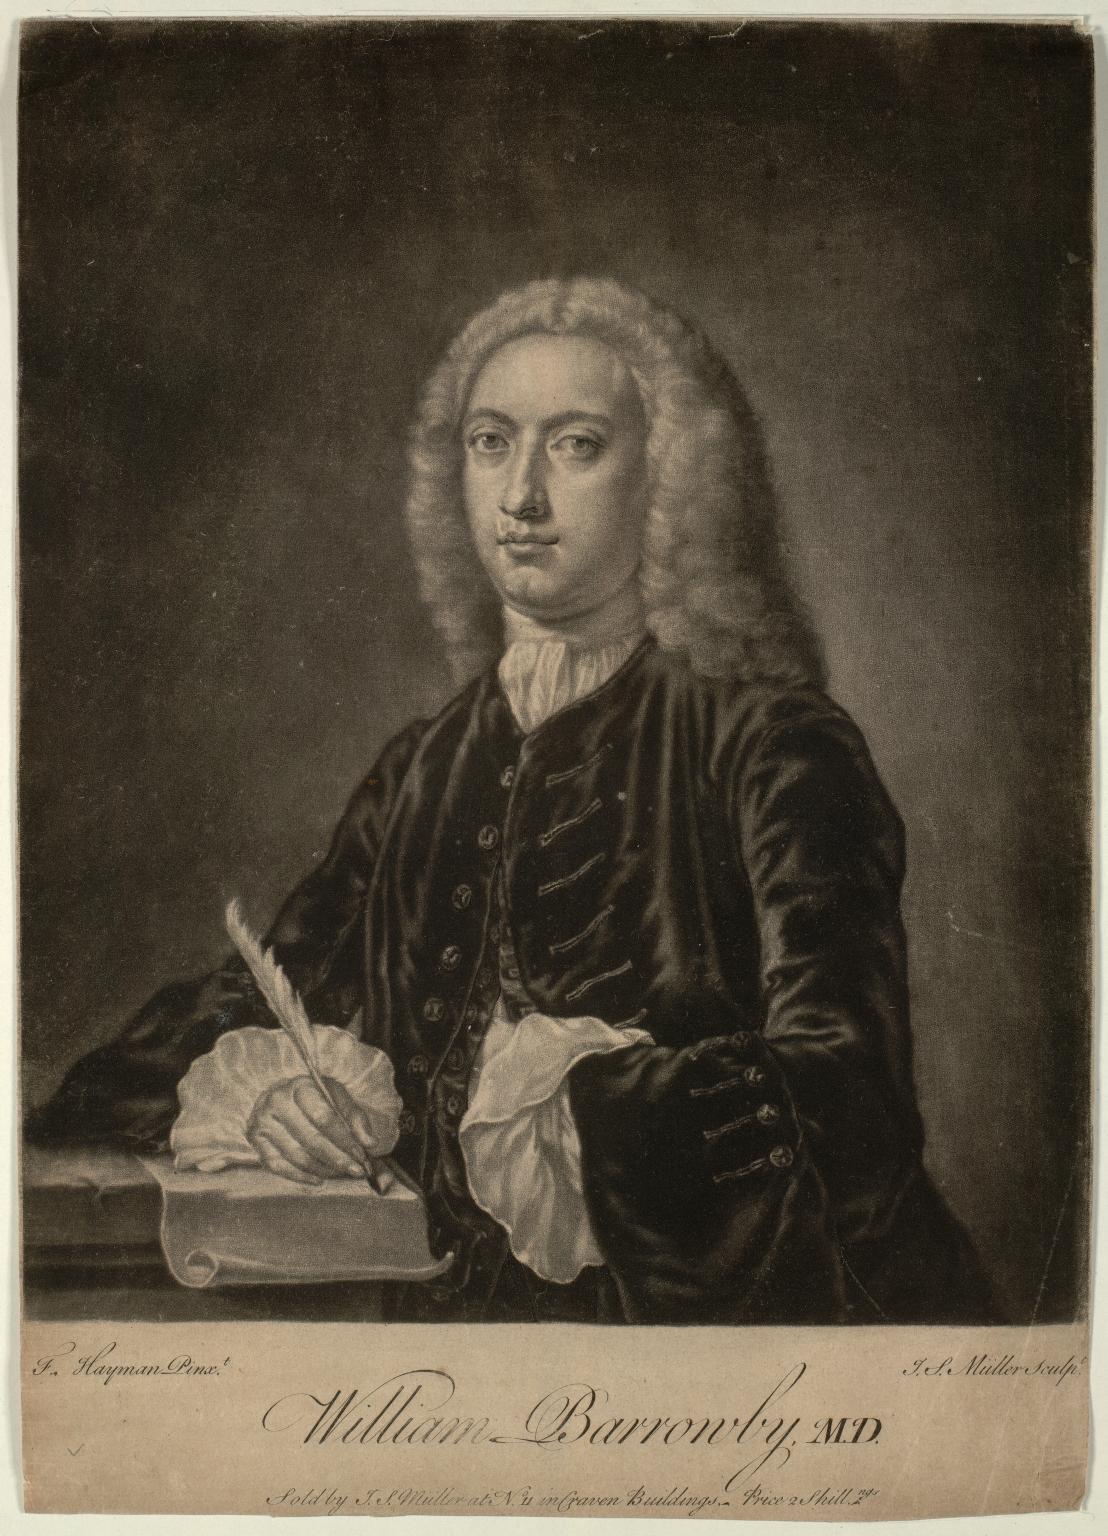 William Barrowby (1682-1751), MD, FRCP. Physician to St Bartholomew's Hospital